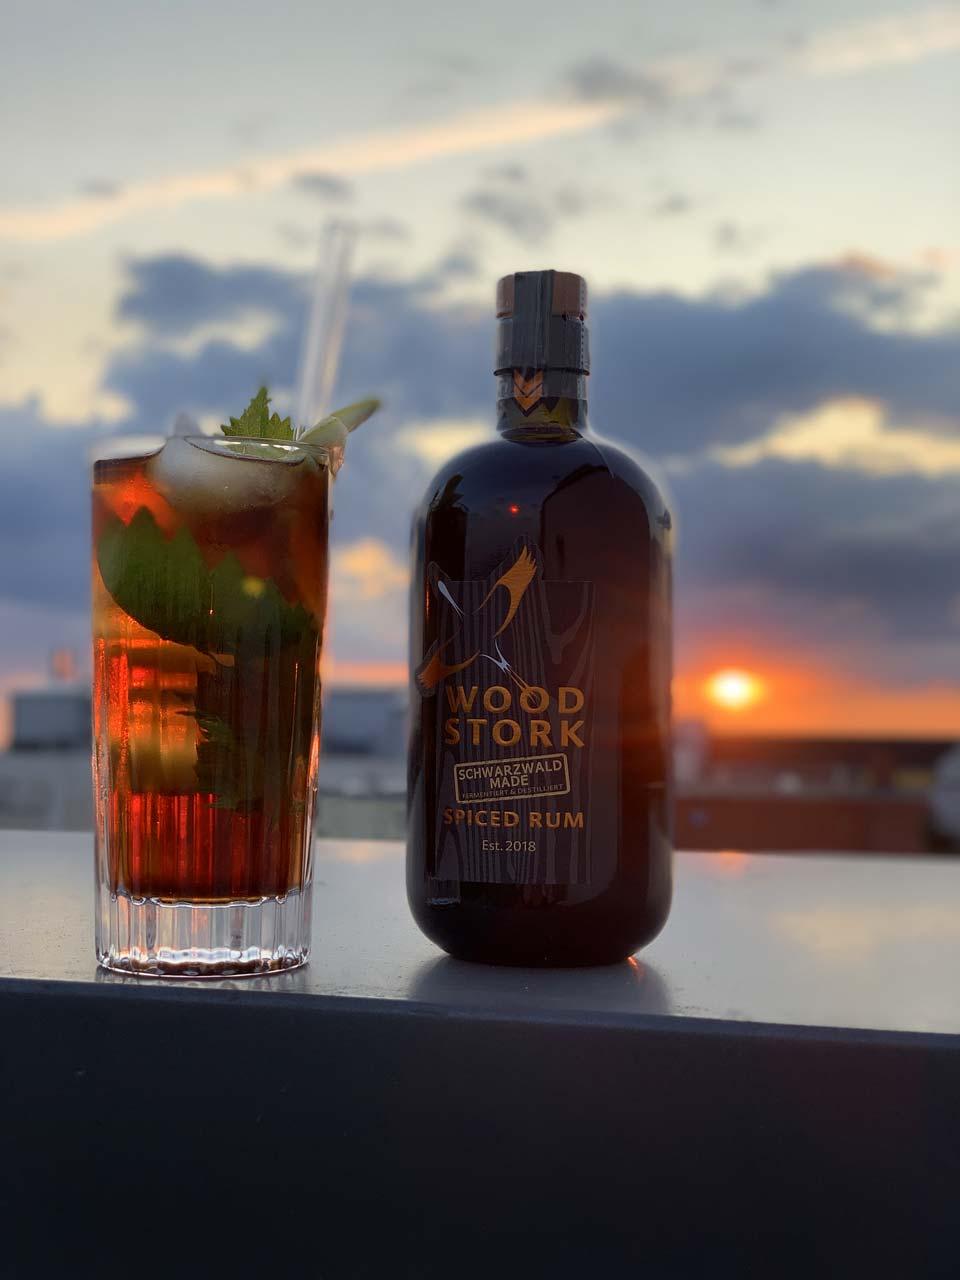 Der perfekte Sundowner: Godjira Cuba Libre mit Wood Stork Siced Rum